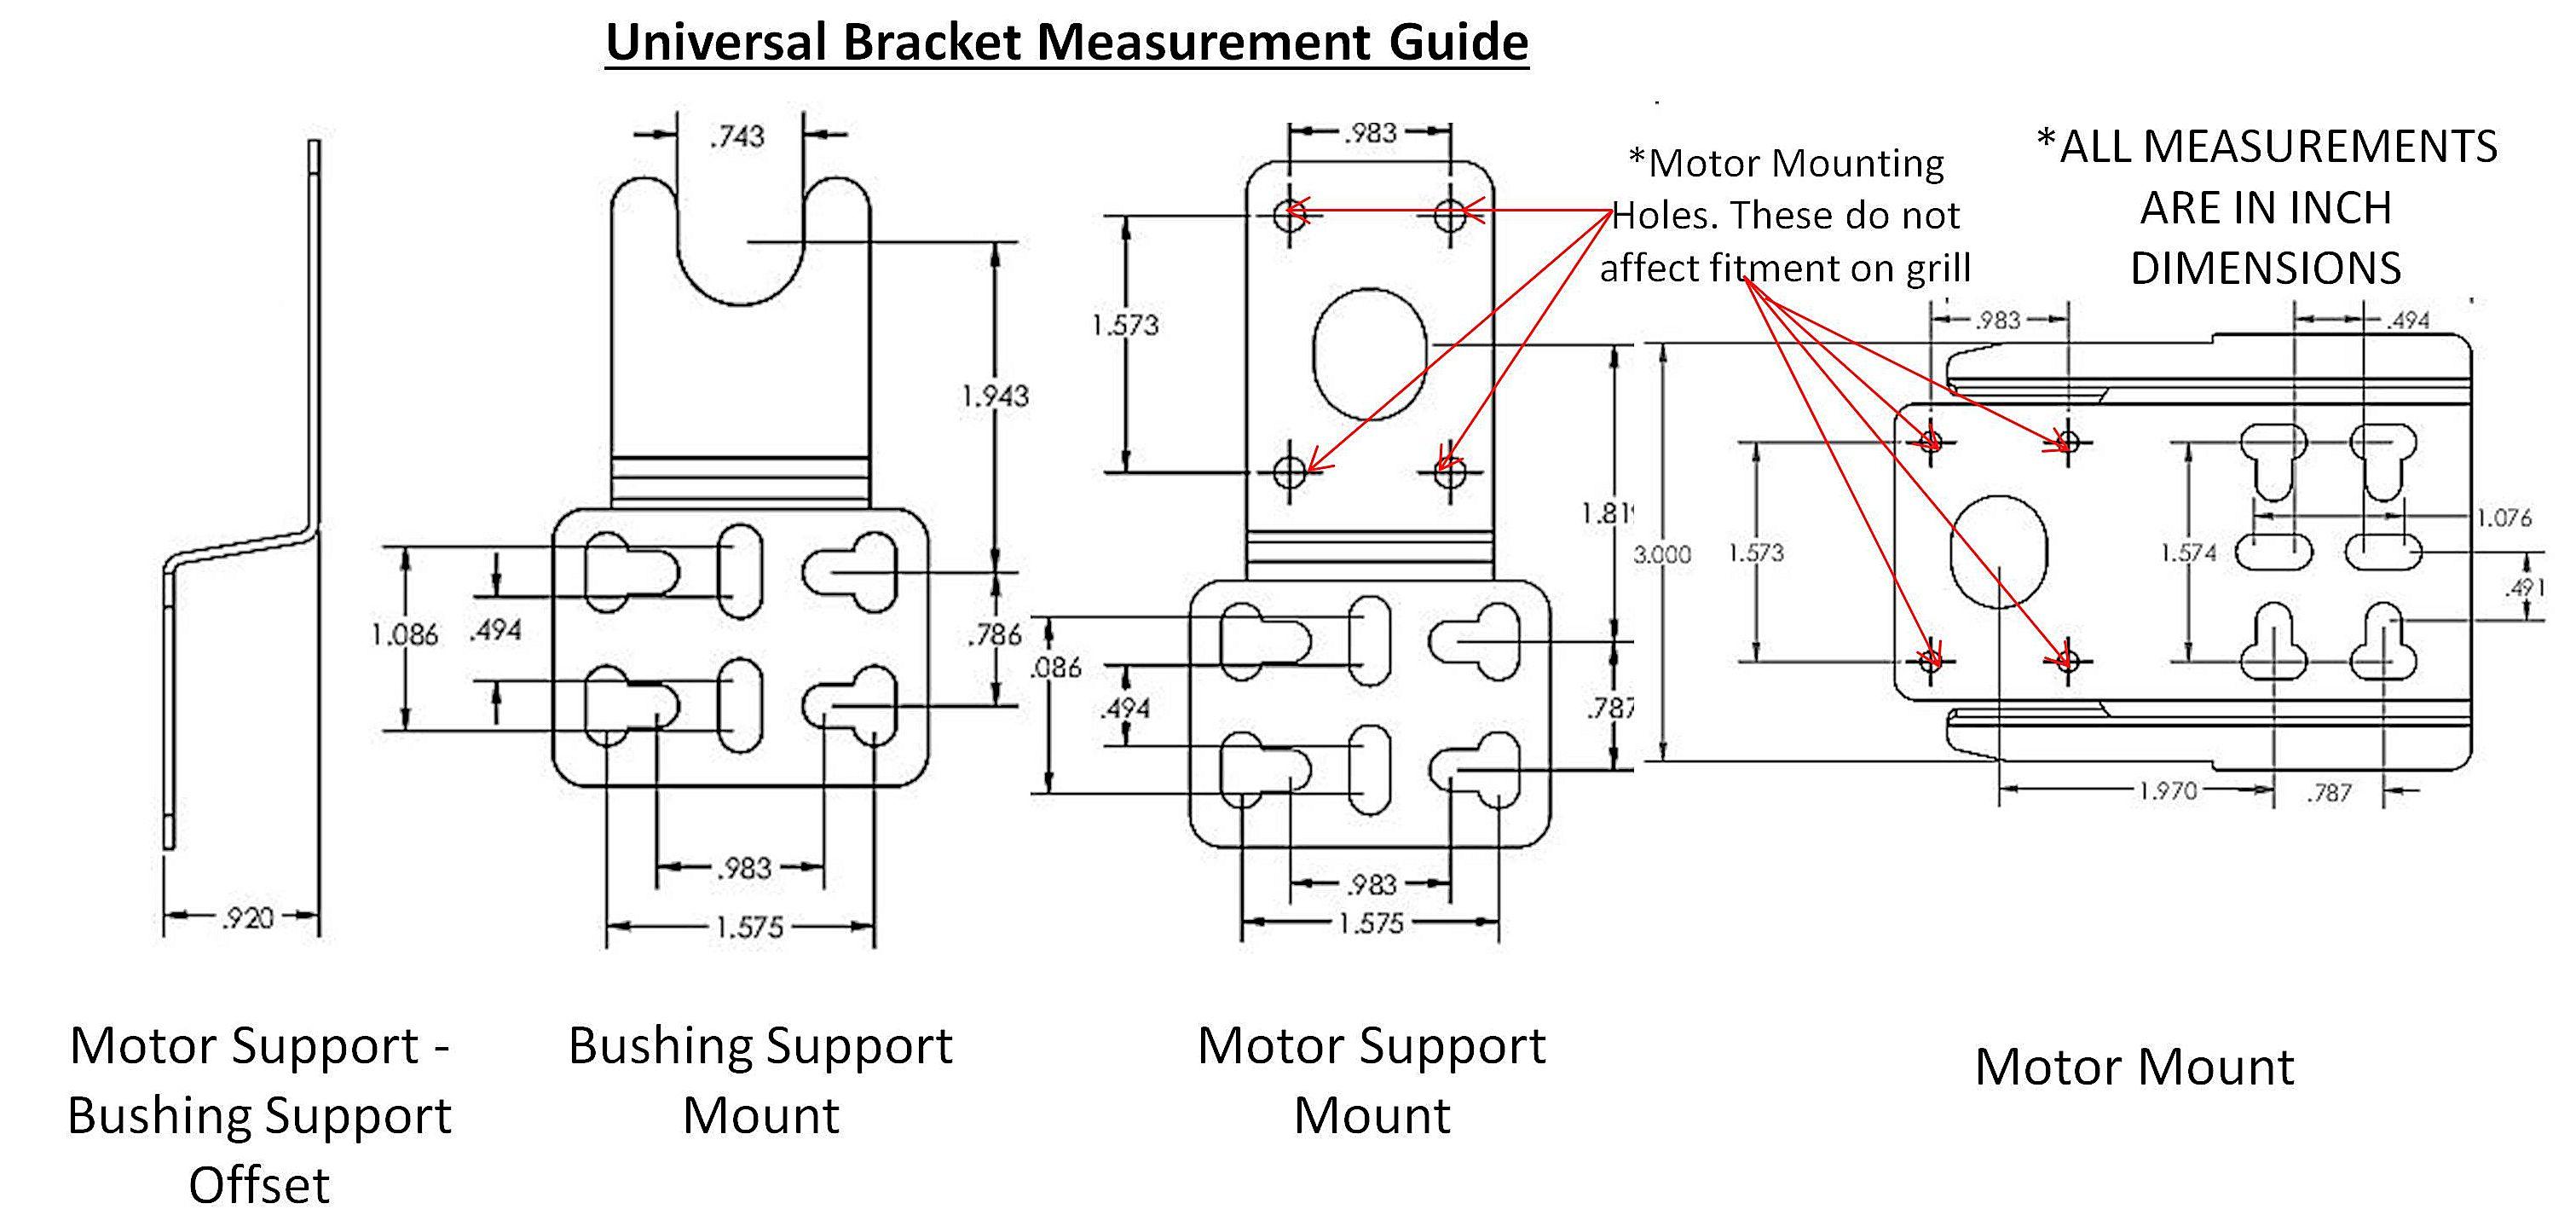 Grill Rotisserie Universal Motor Mounting Bracket Set